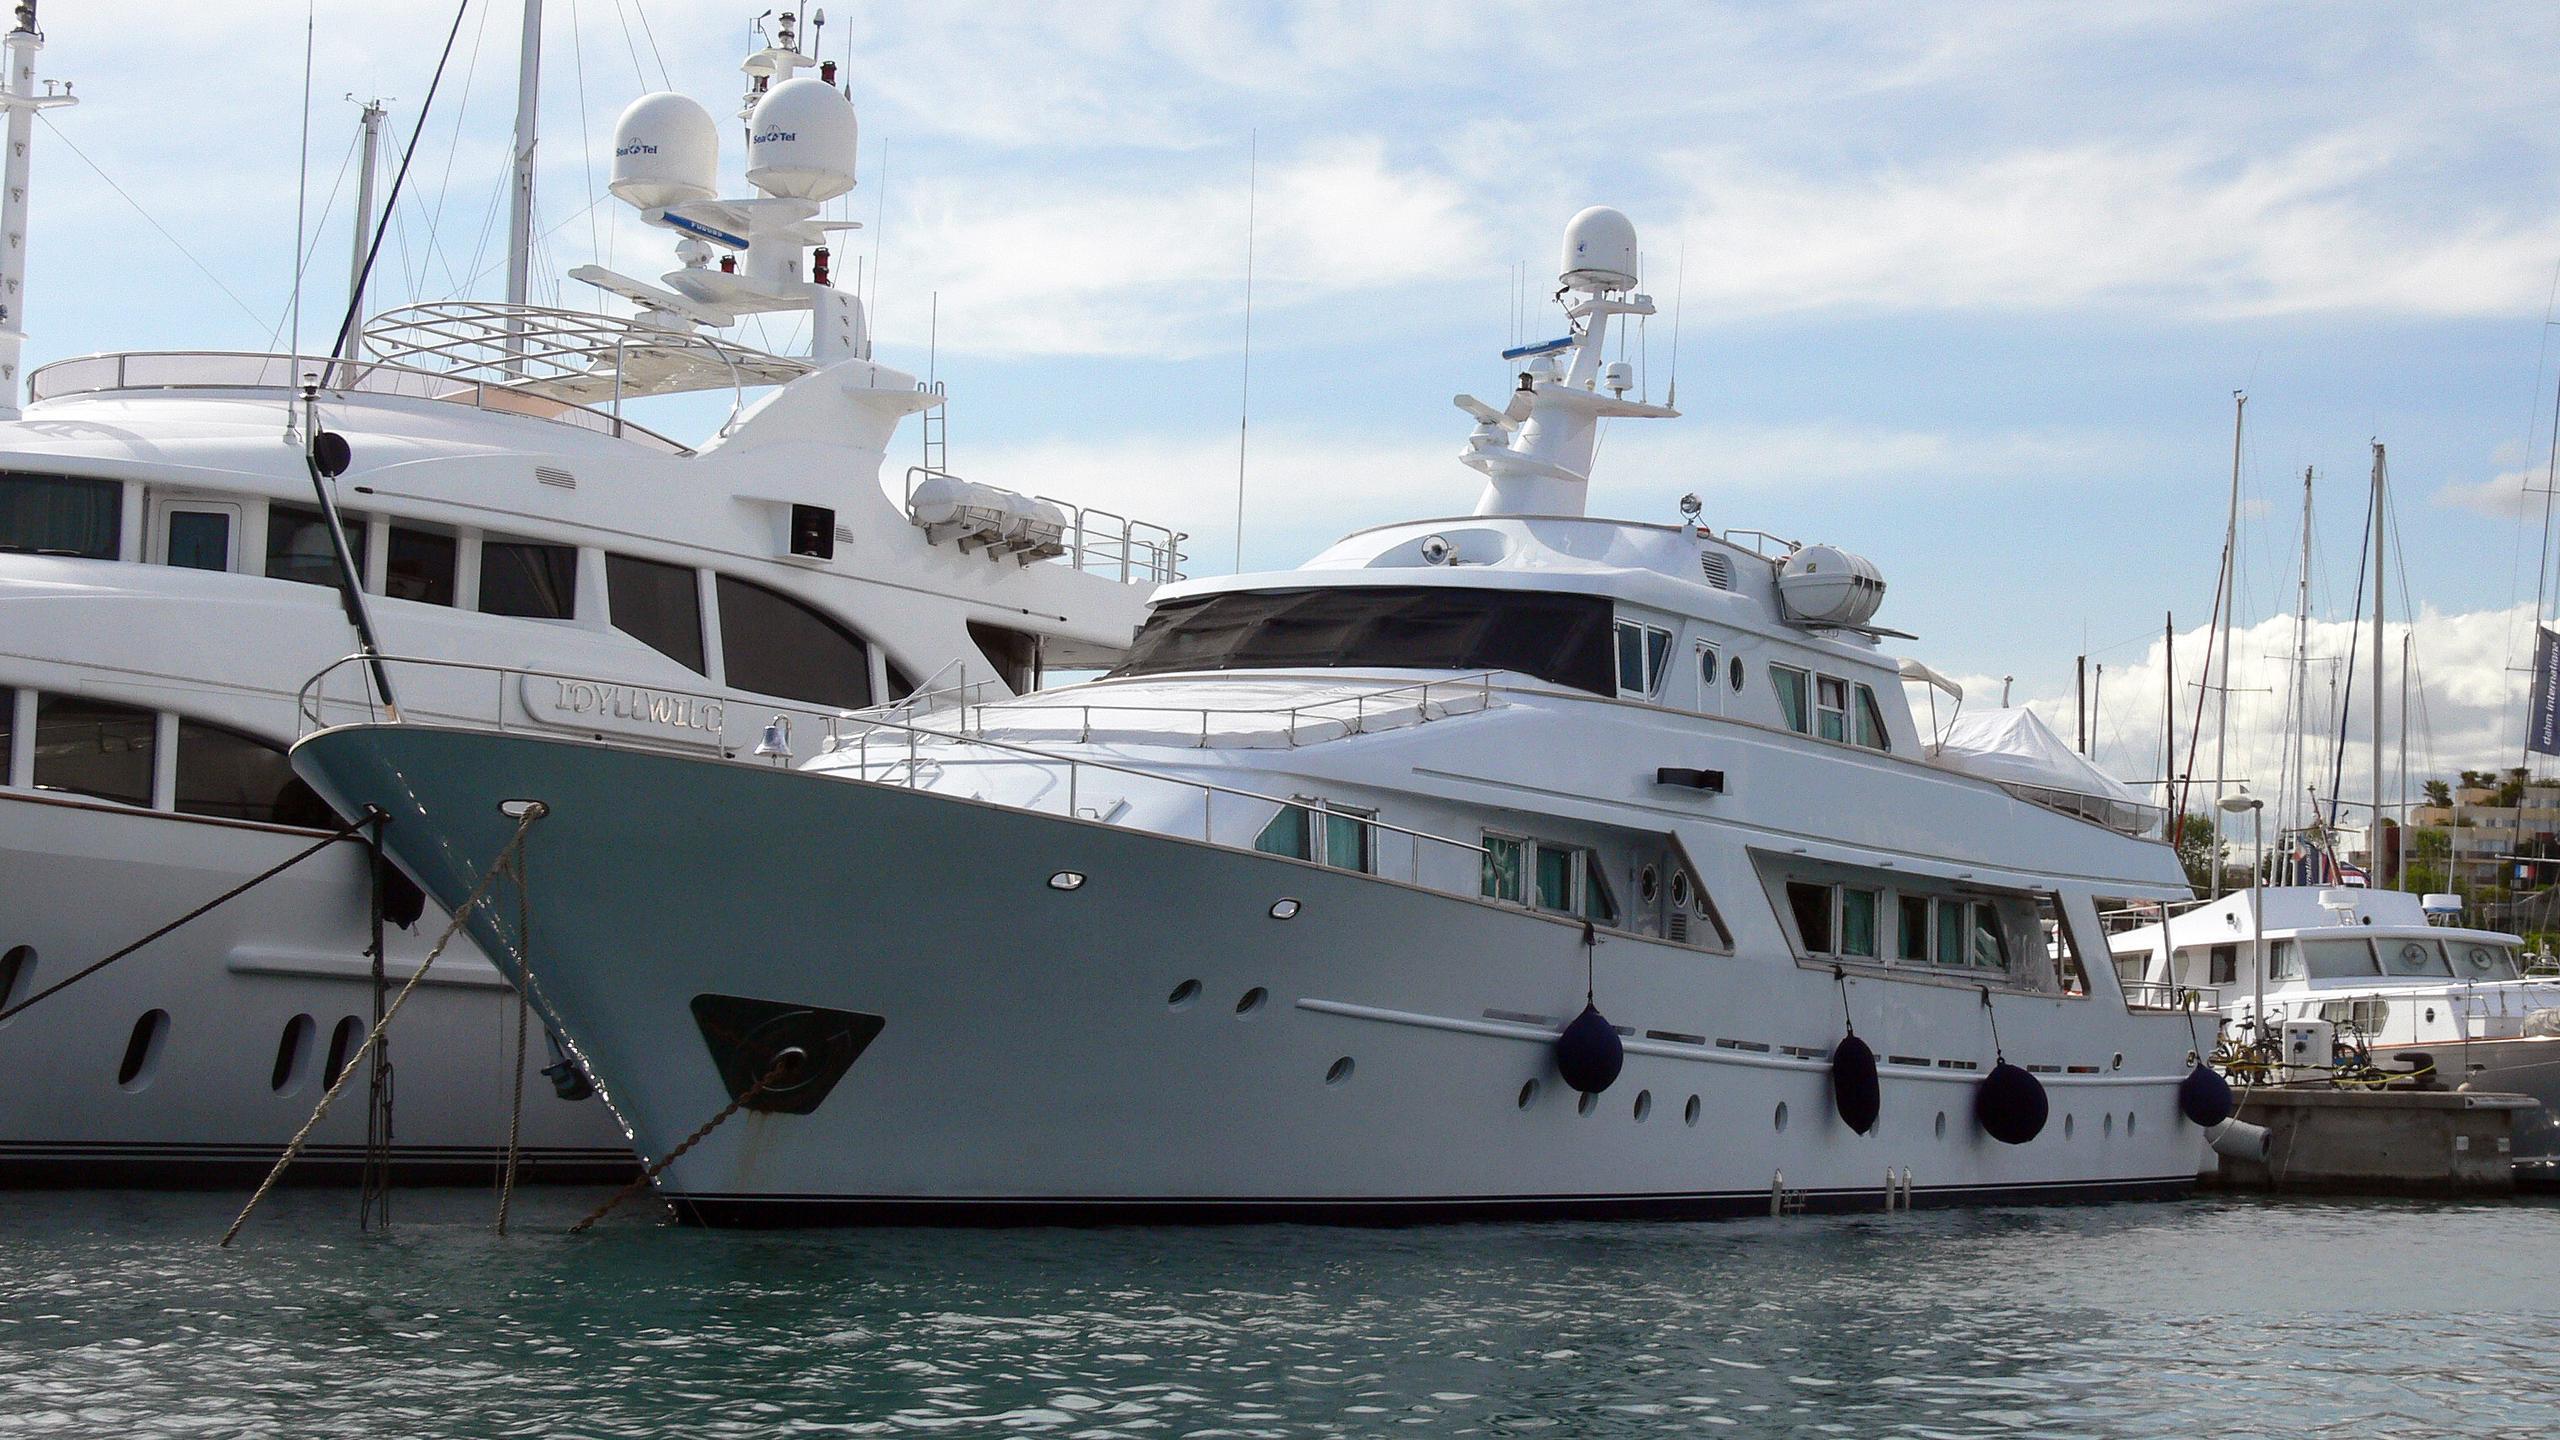 freemont-motor-yacht-benetti-1983-34m-half-profile